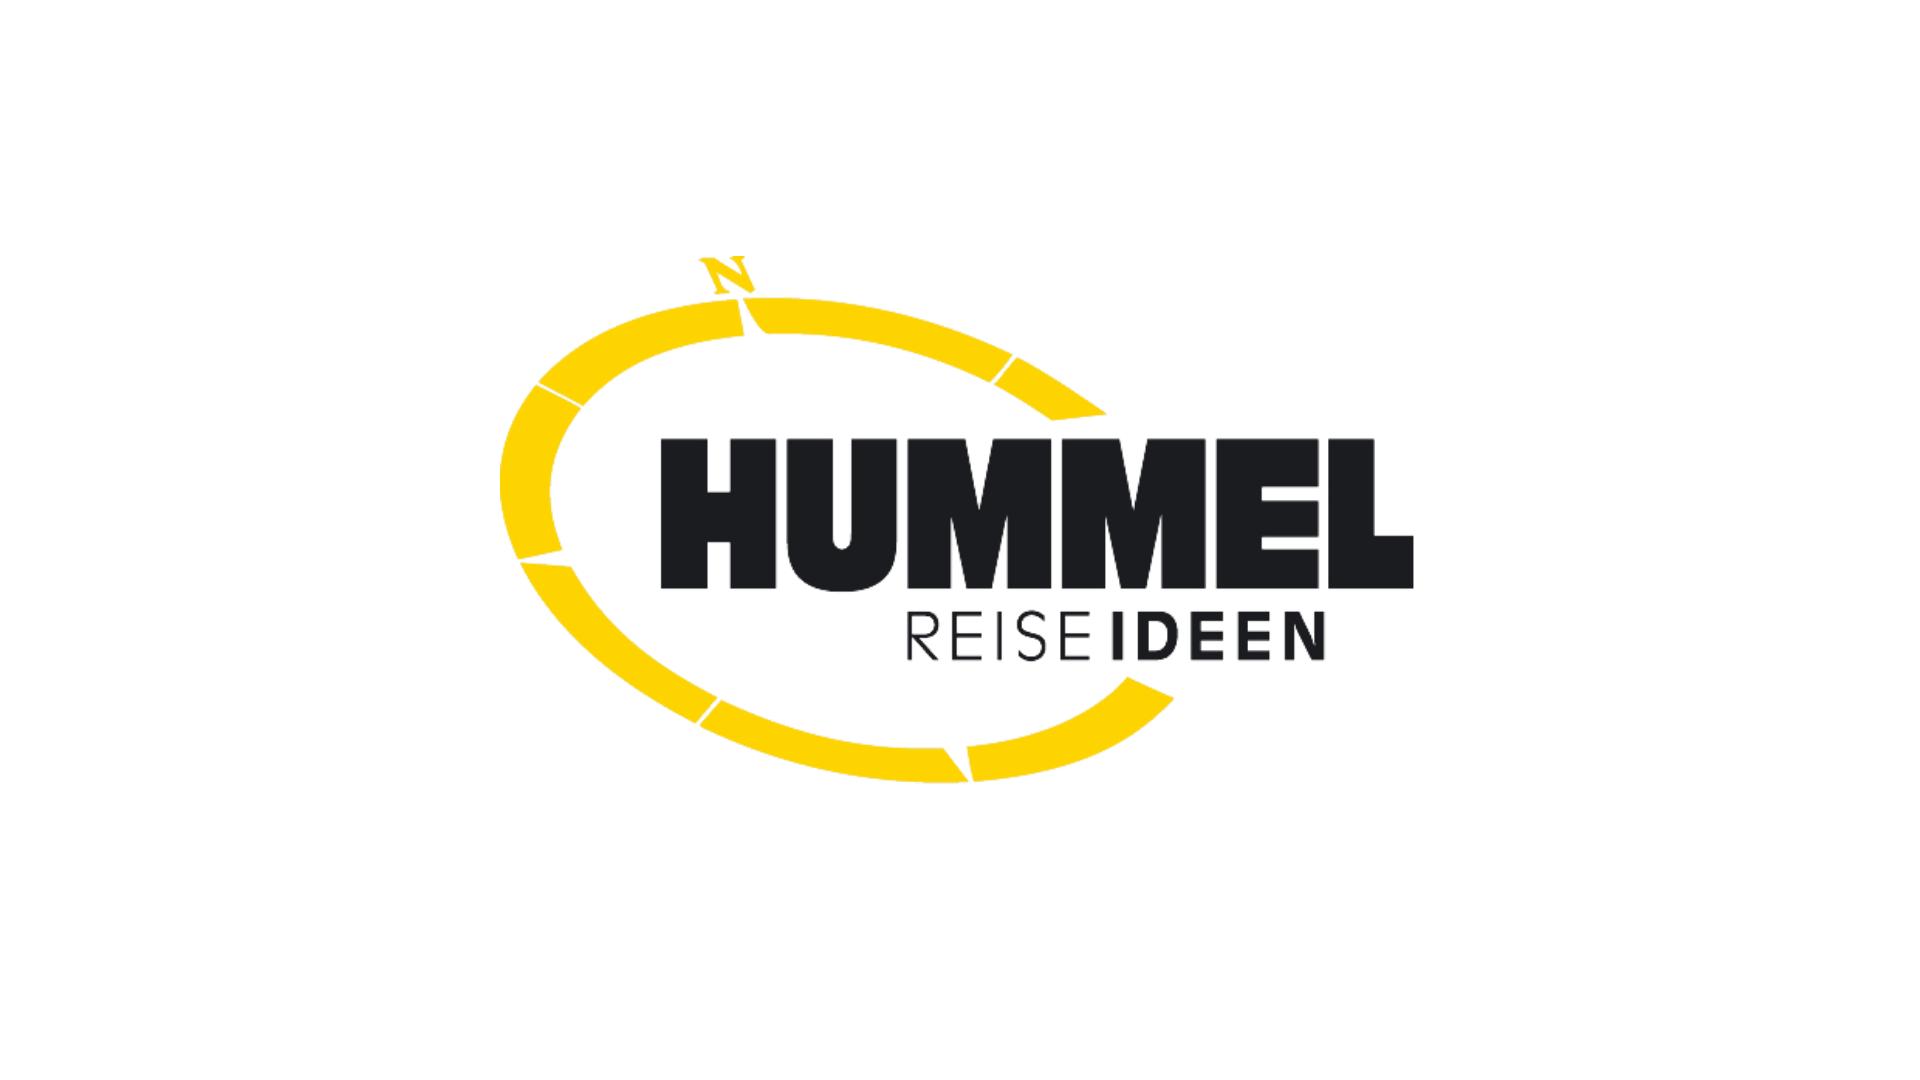 hummel-reiseideen-logo-w